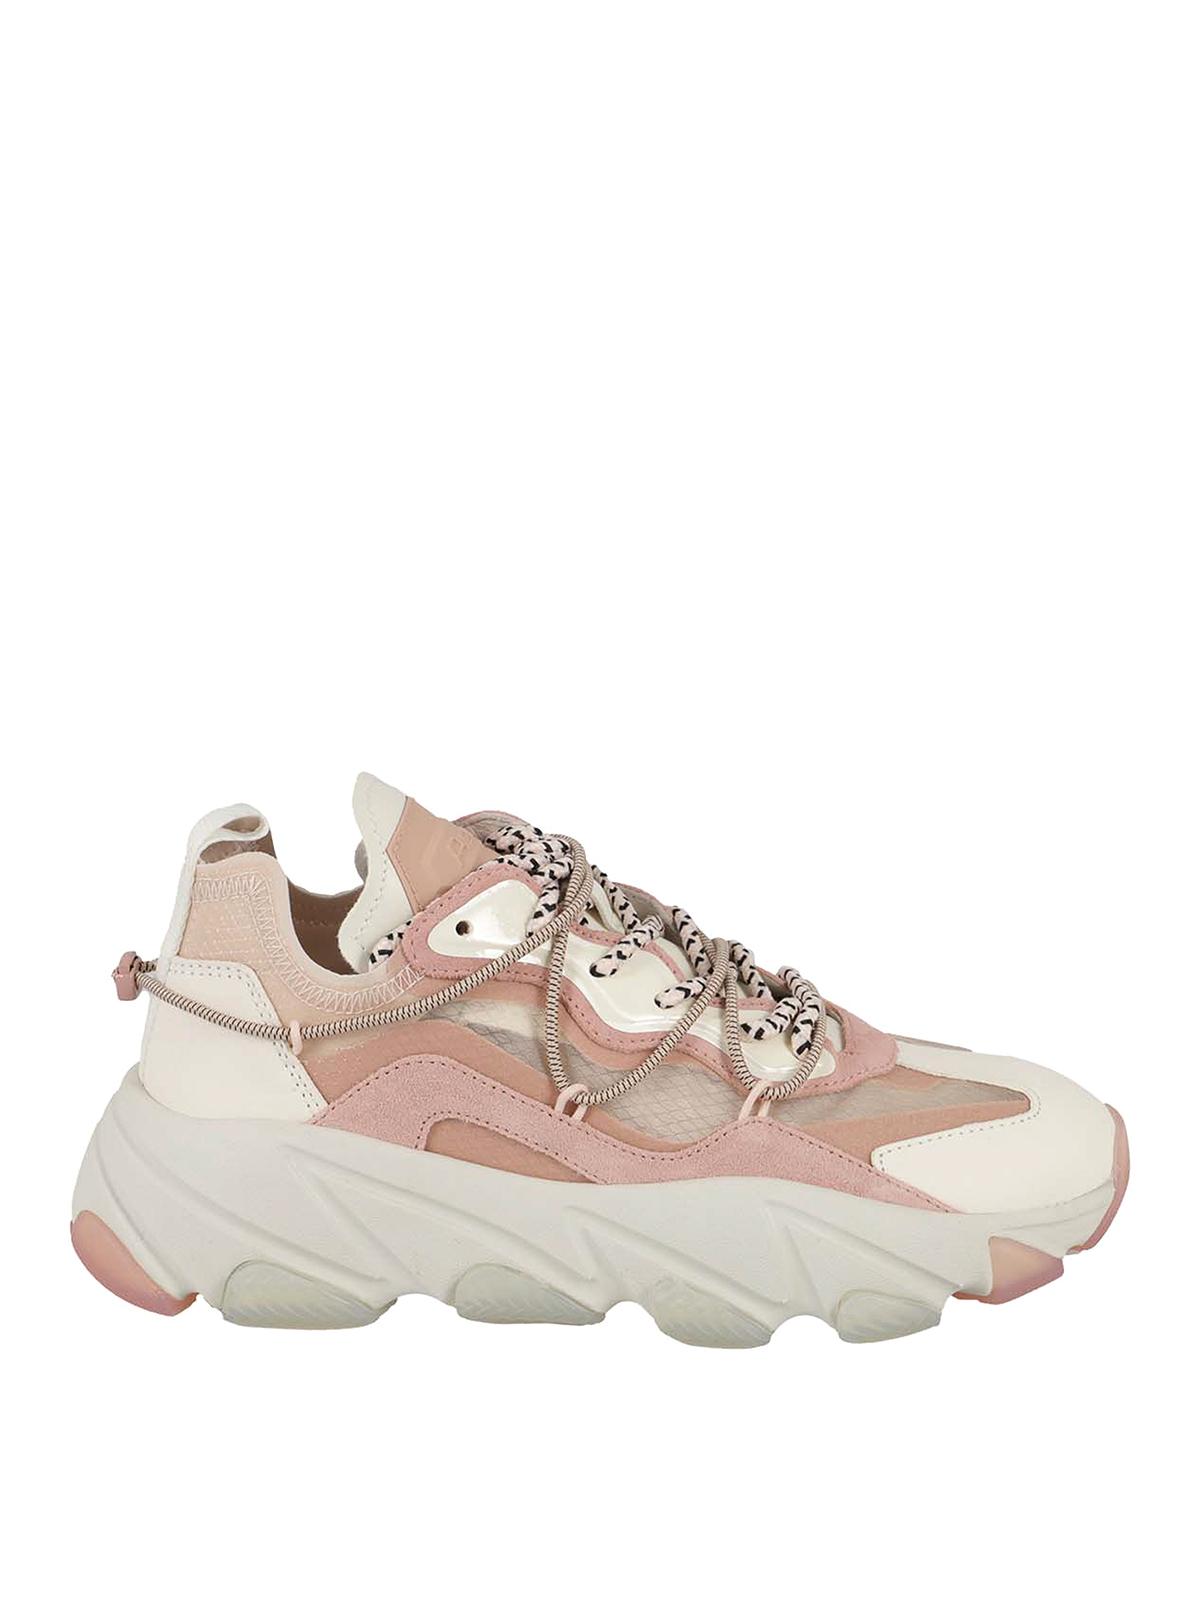 Ash Sneakers EXTRABIS SNEAKERS